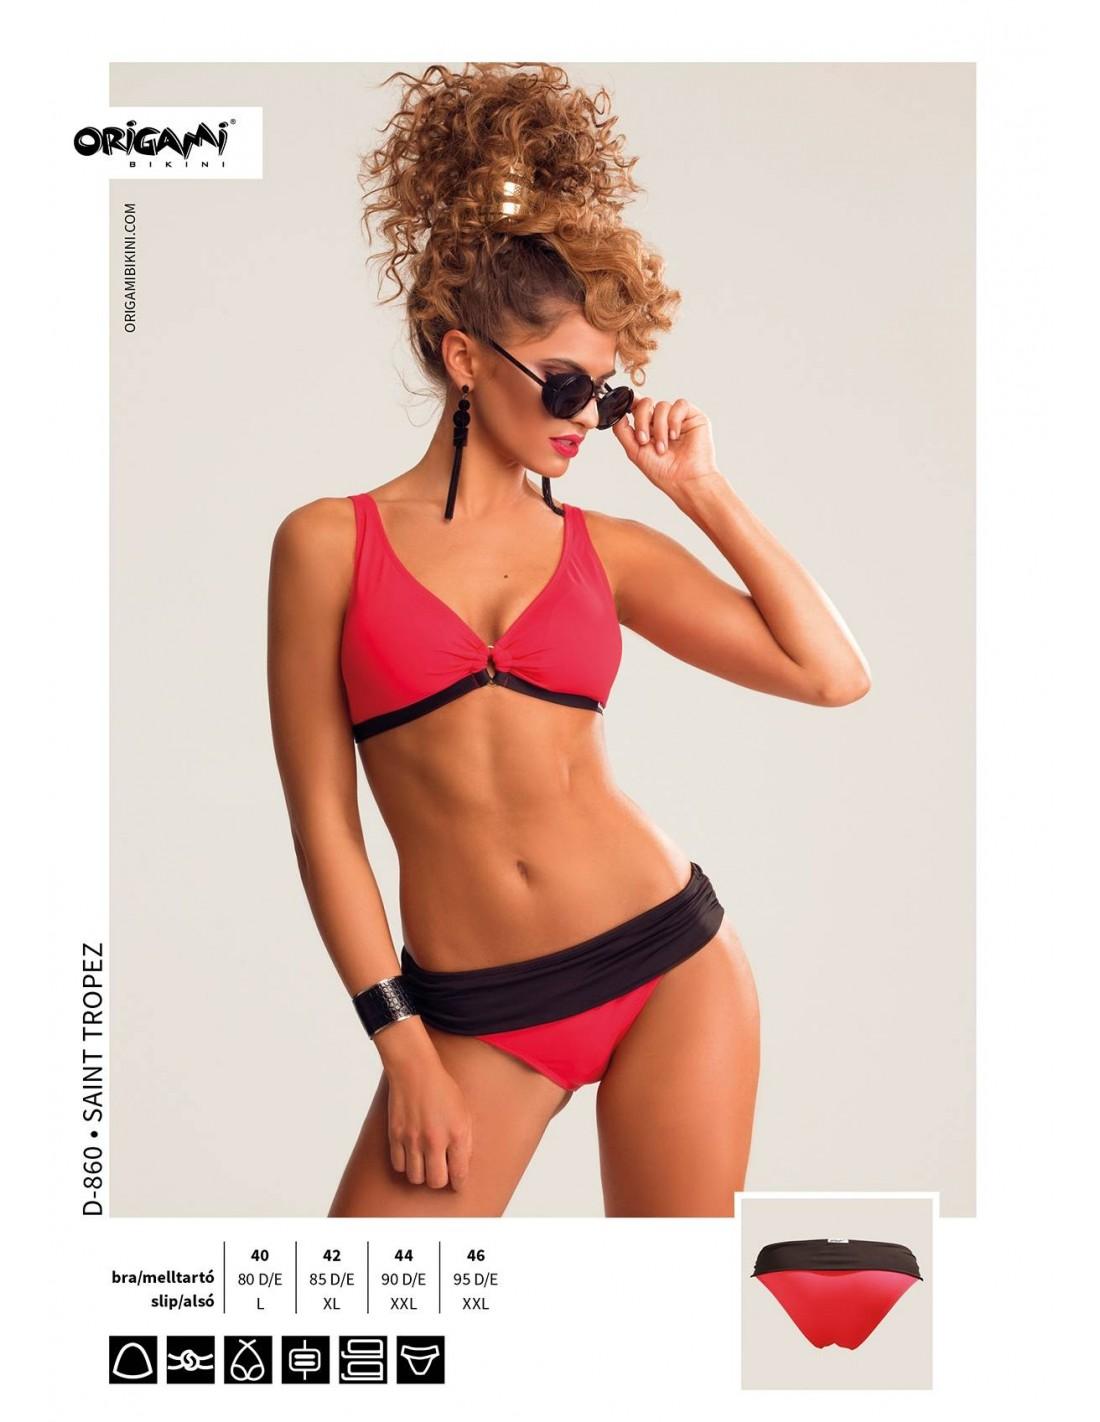 Origami Bikini Saint Tropez D-860 Méret 95D   3XL   46 d5869ae2d0